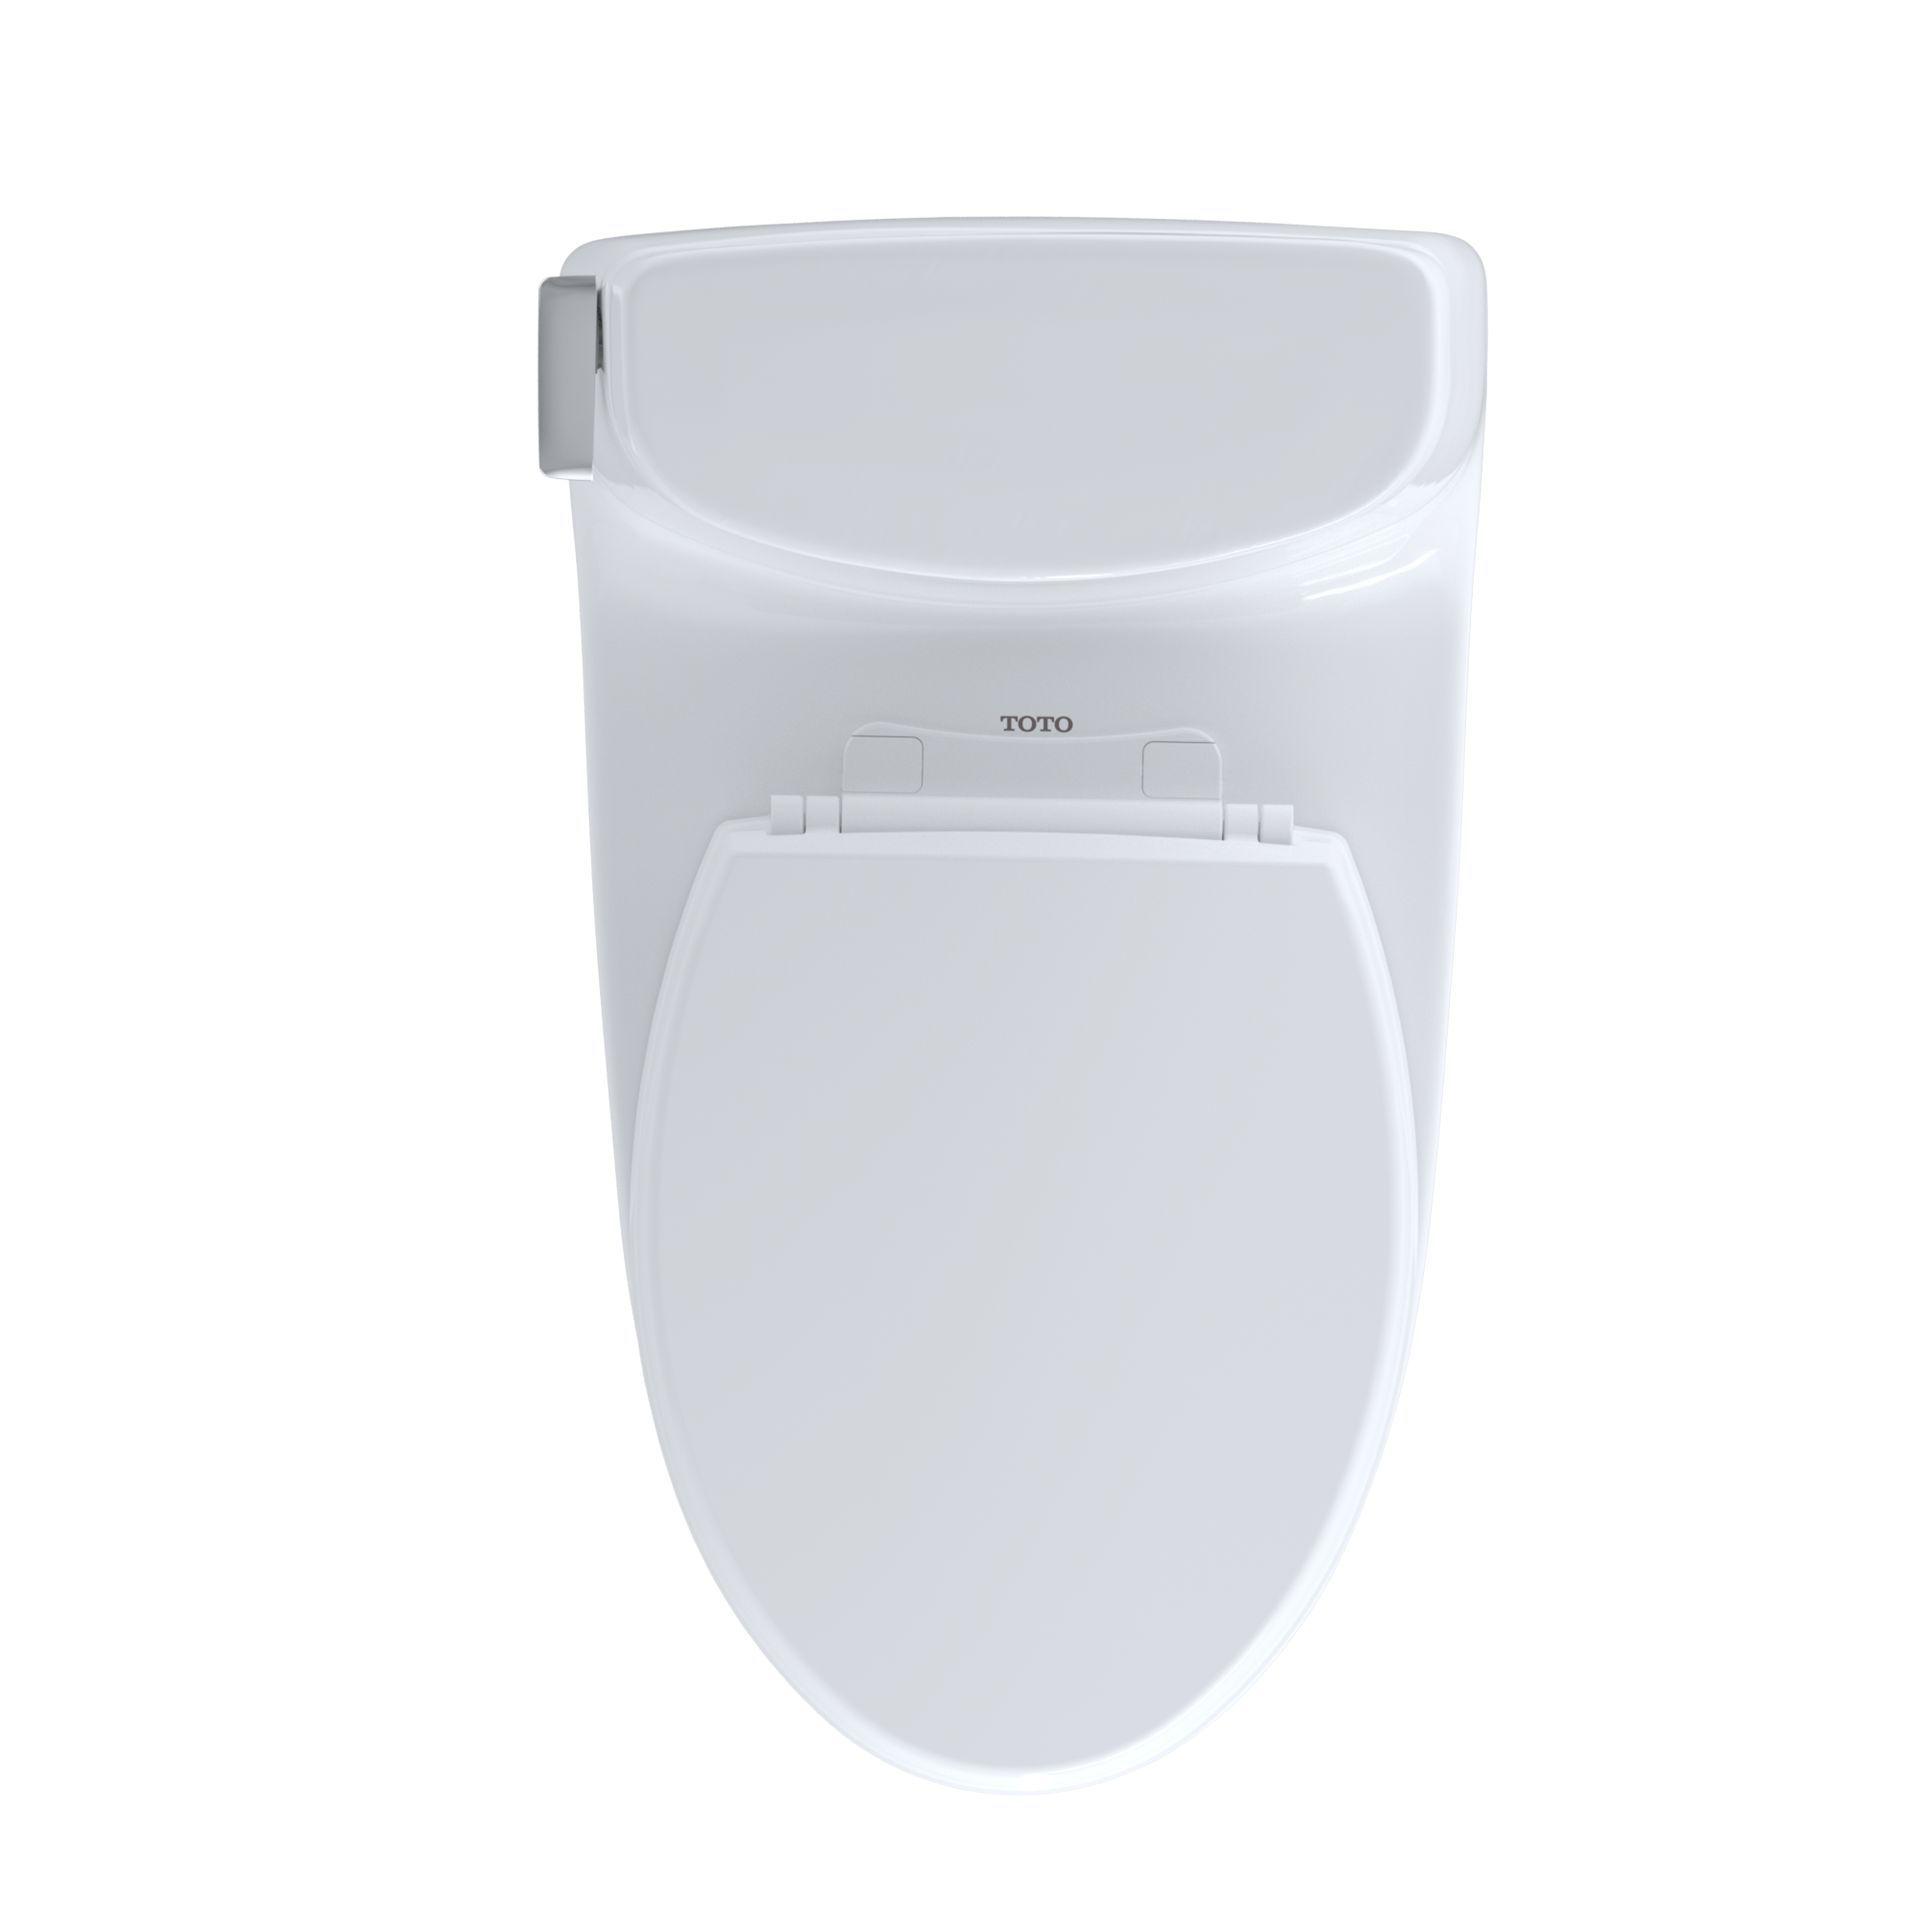 Sensational Carlyle Ii 1G One Piece Toilet 1 0 Gpf Elongated Bowl Beatyapartments Chair Design Images Beatyapartmentscom